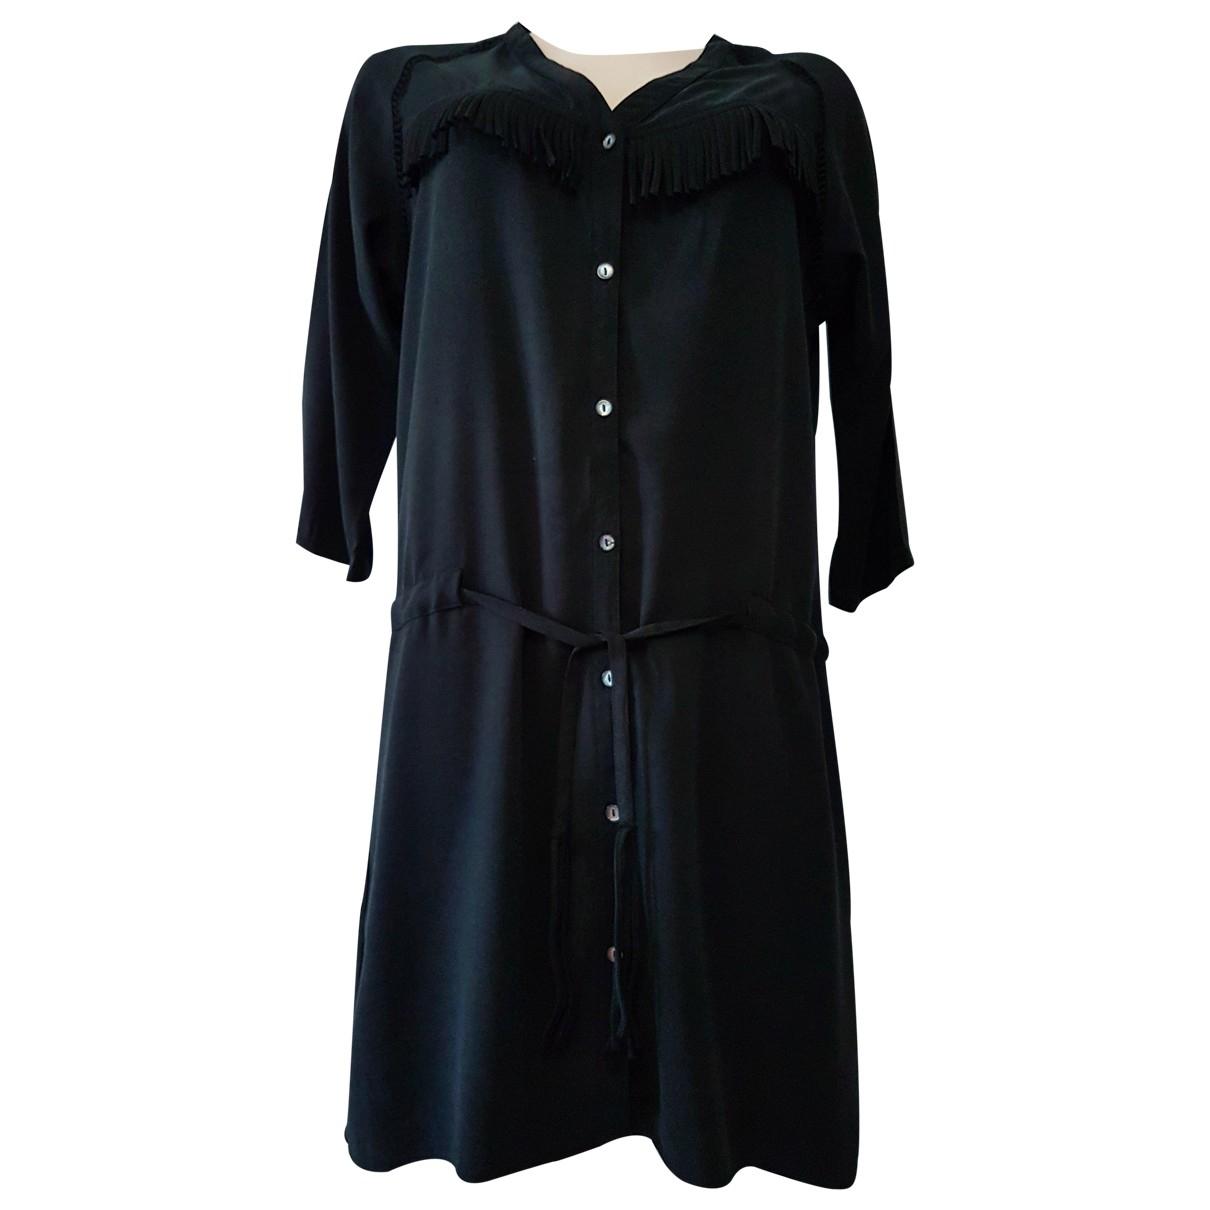 Maison Scotch \N Black Cotton dress for Women 2 0-5